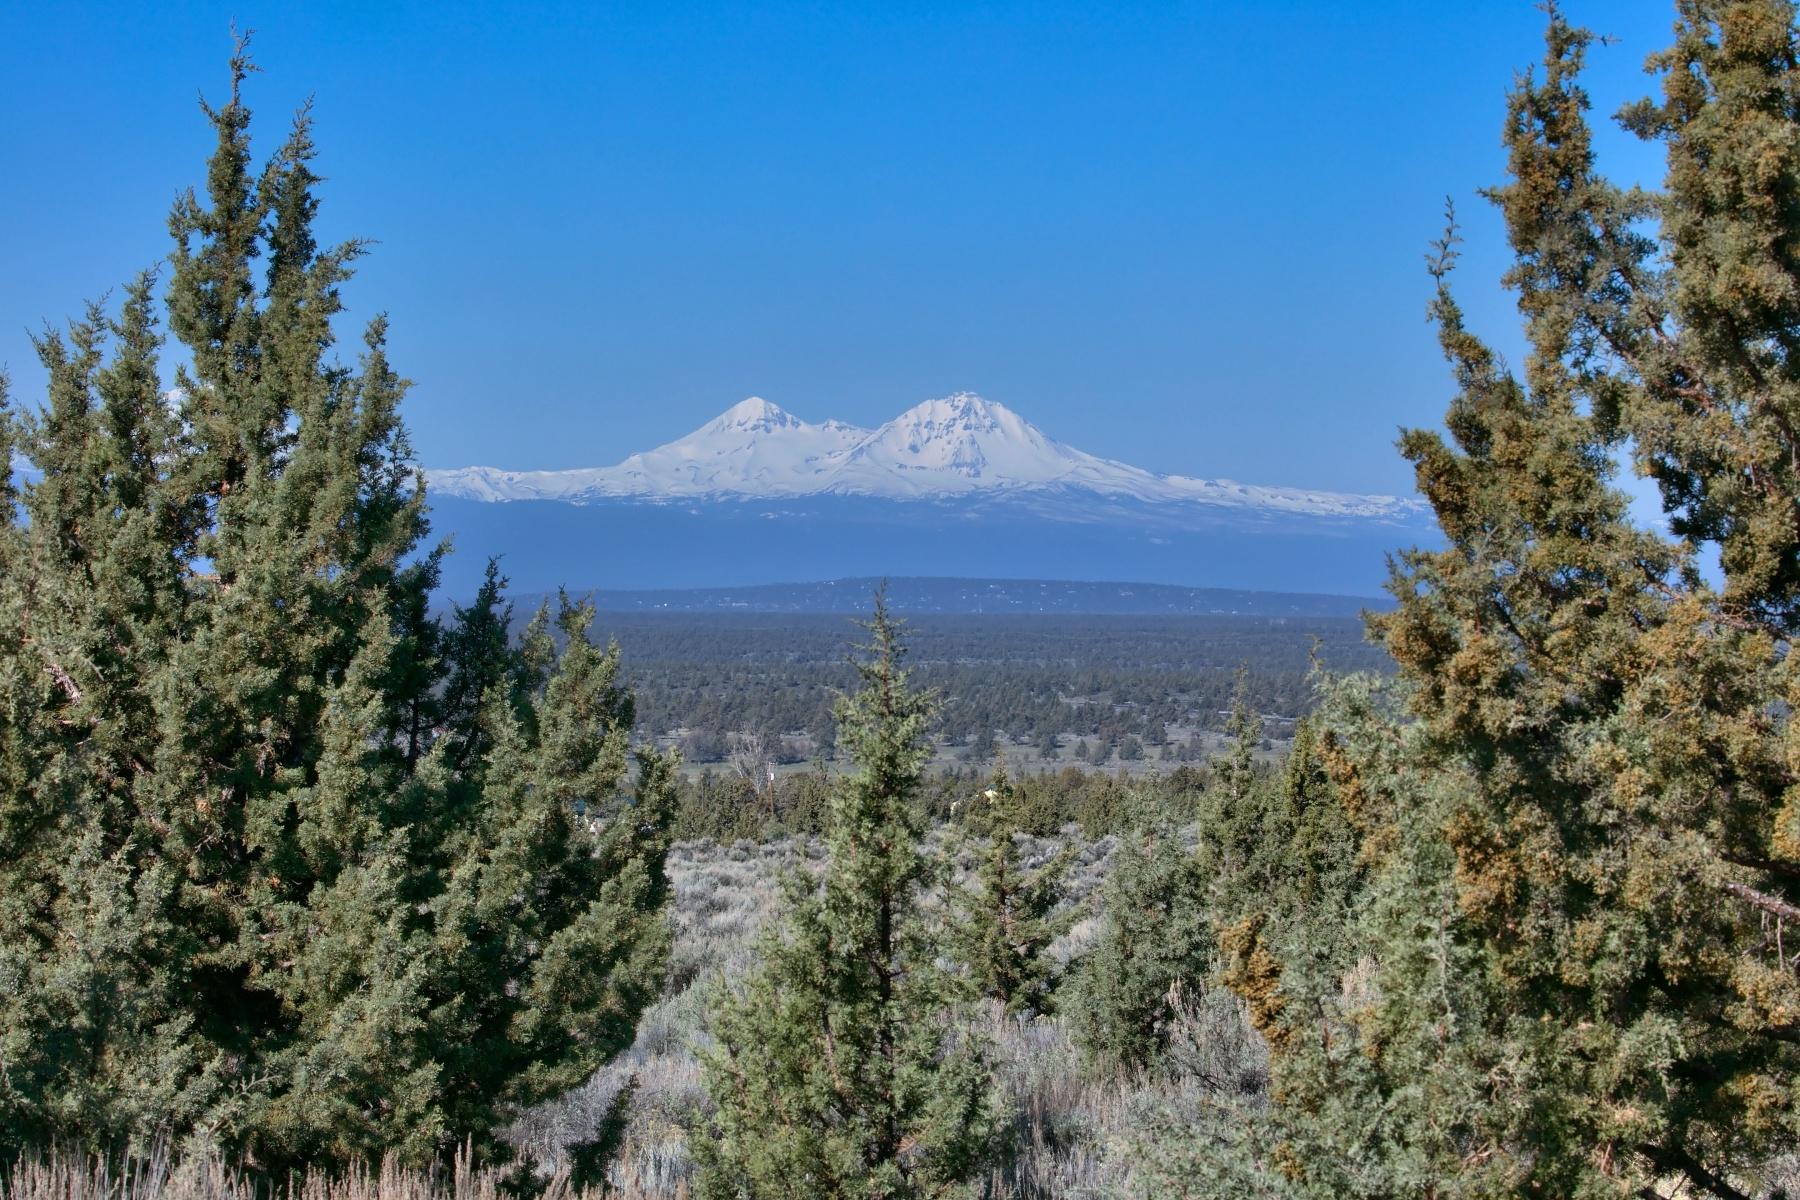 Terreno por un Venta en Powell Butte Potential Development 0 Shumway Rd Powell Butte, Oregon, 97753 Estados Unidos